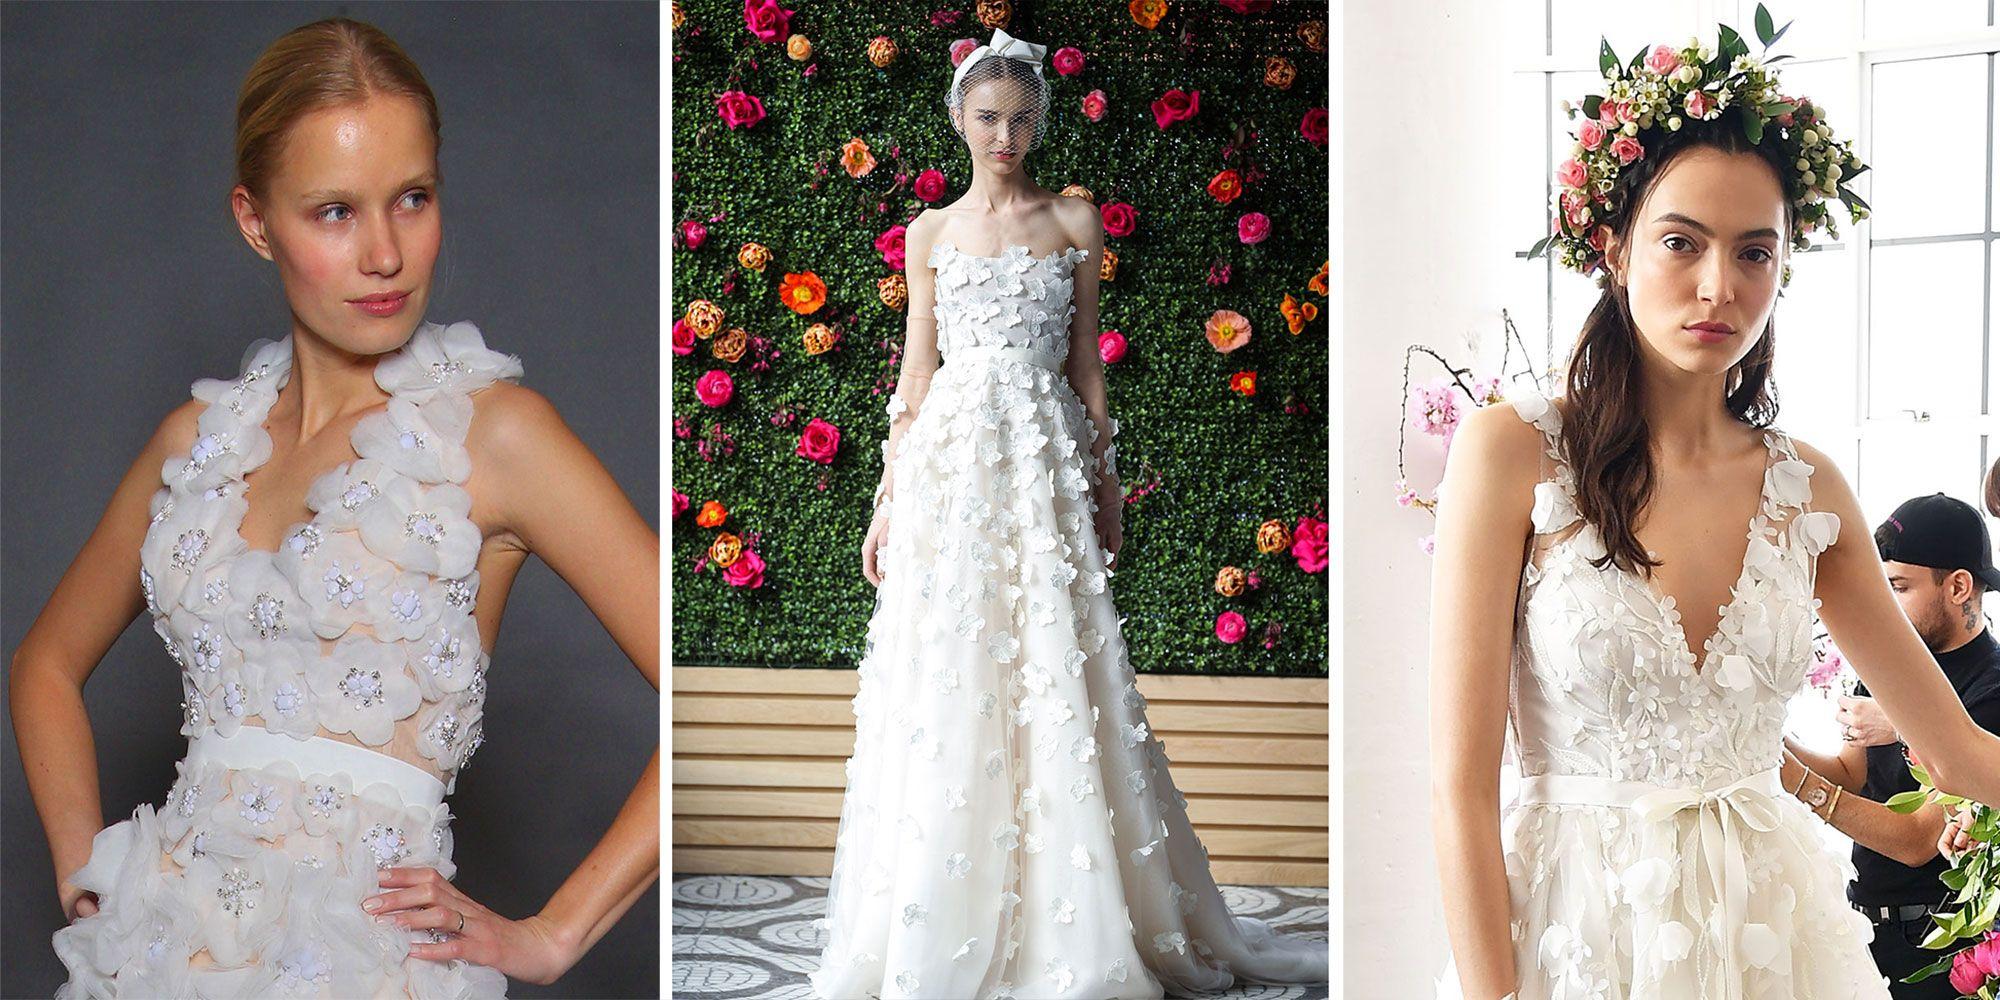 The prettiest floral wedding dresses from Bridal Fashion Week